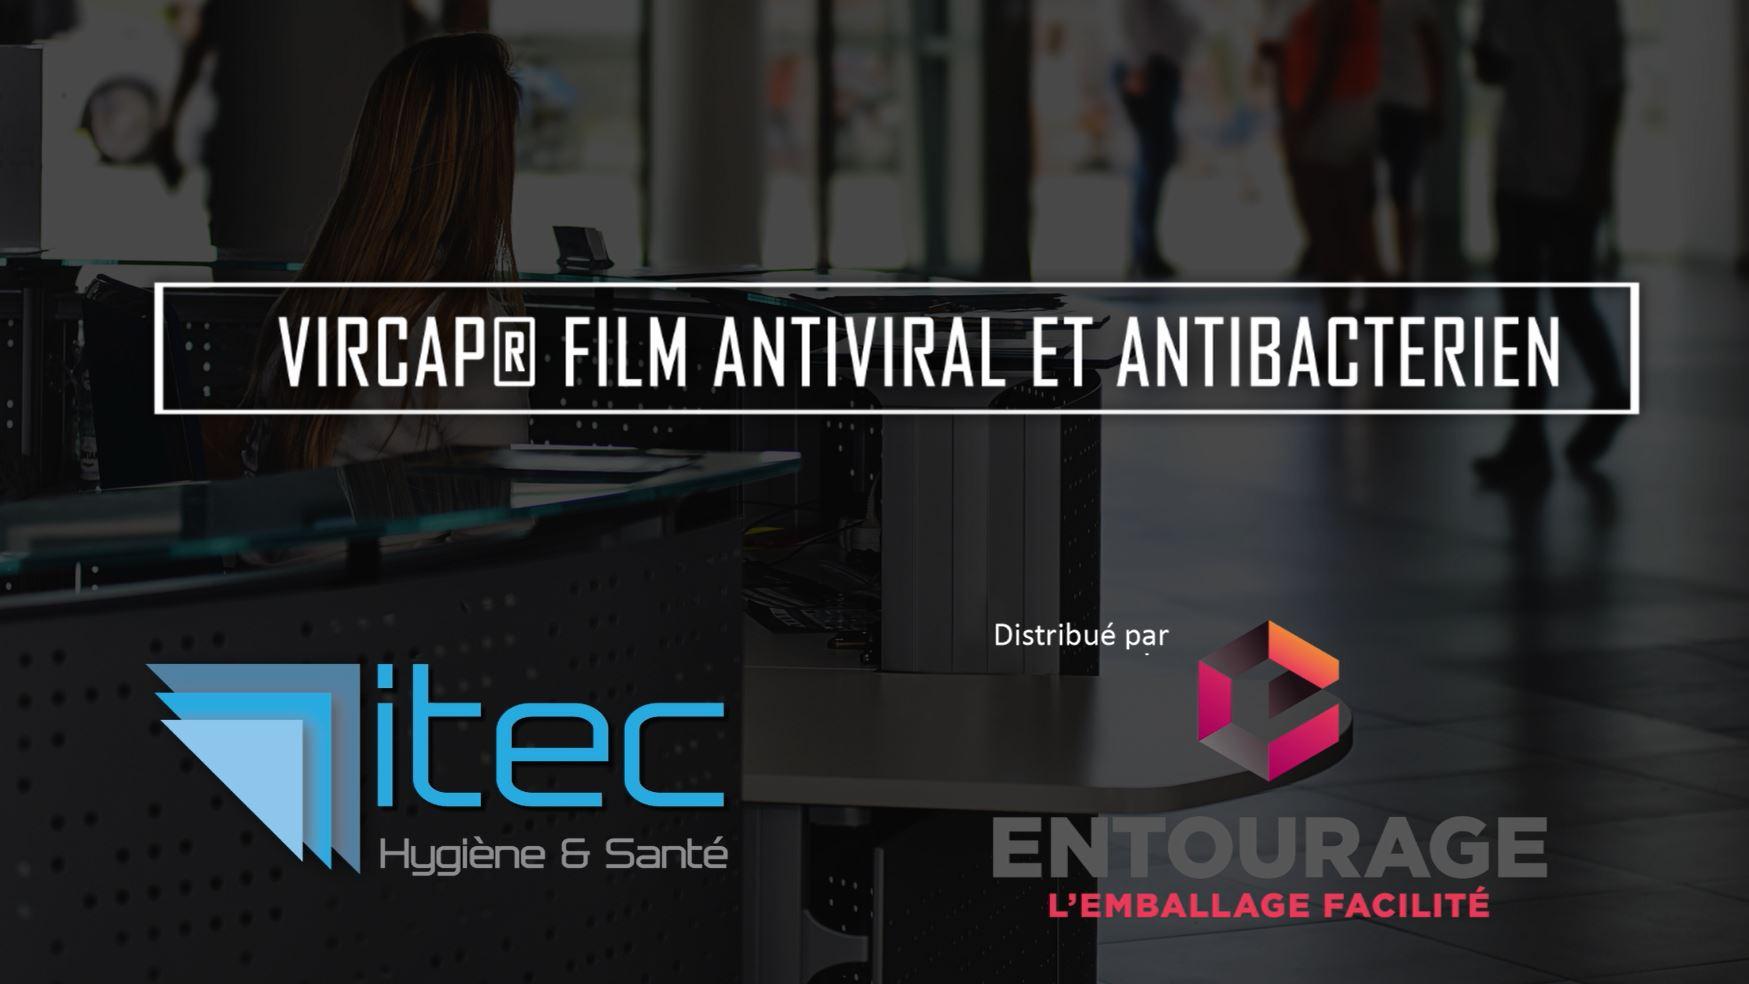 Vircap film antiviral antibactérien